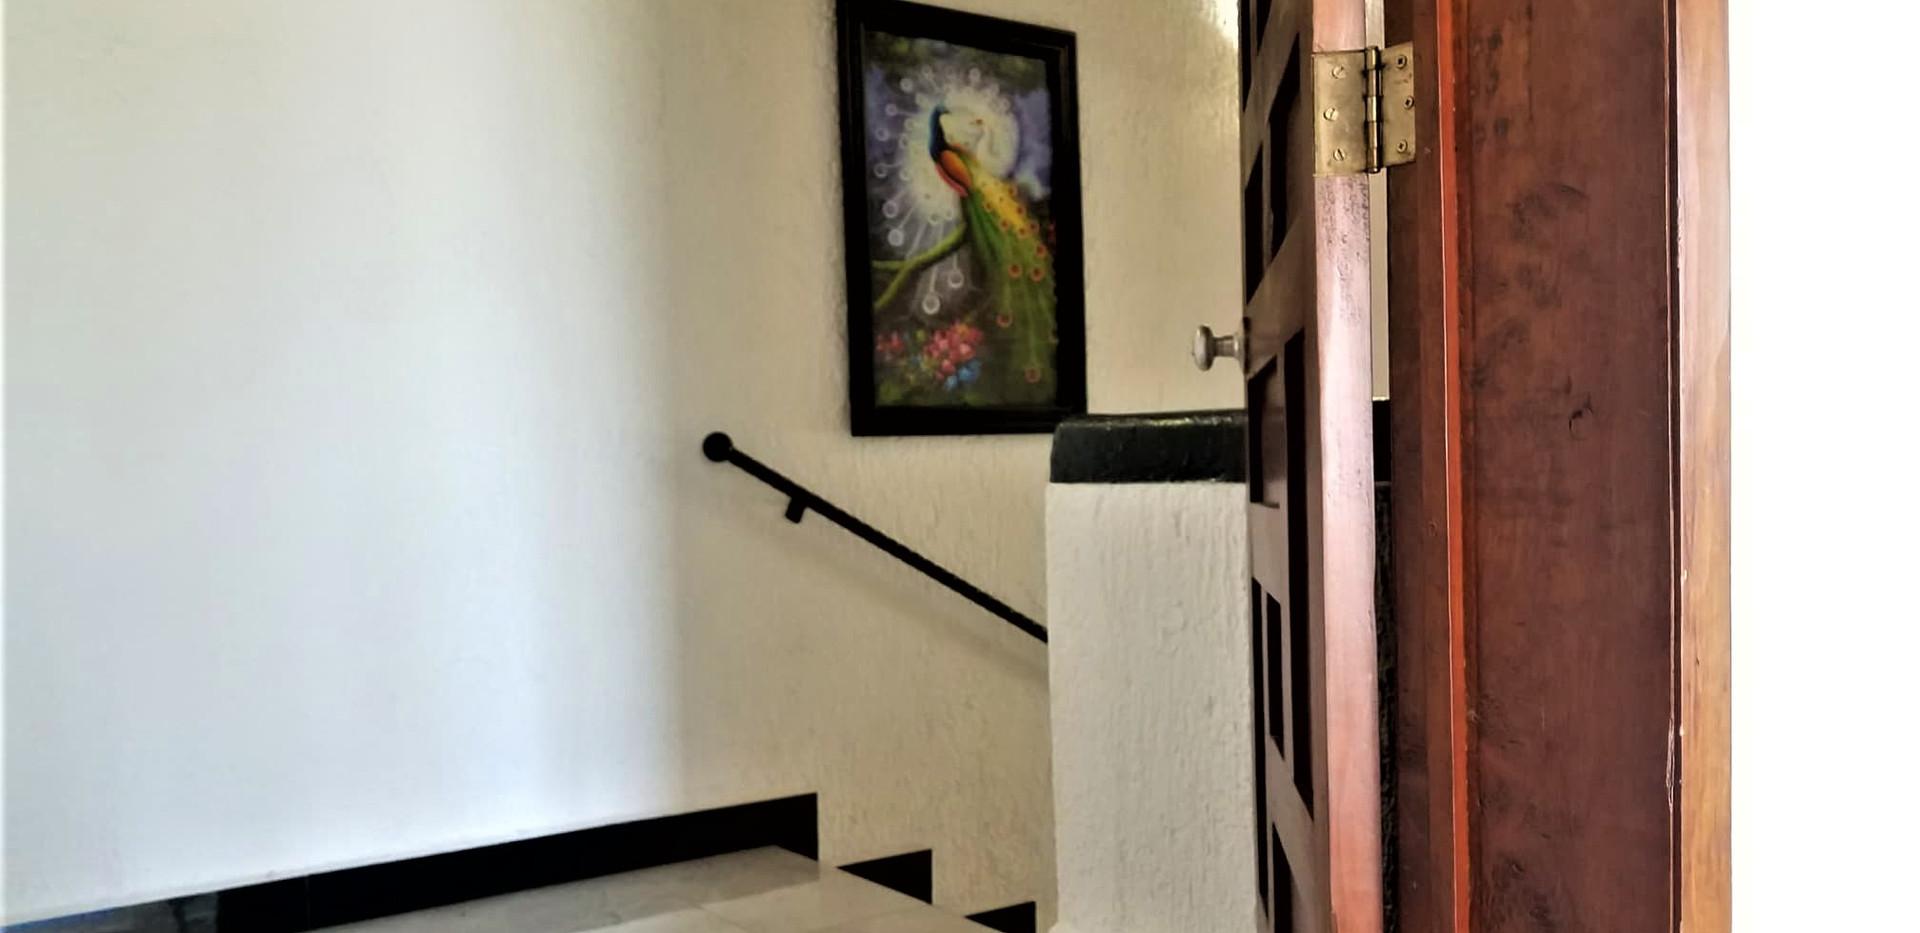 Downstairs wall decor.jpg